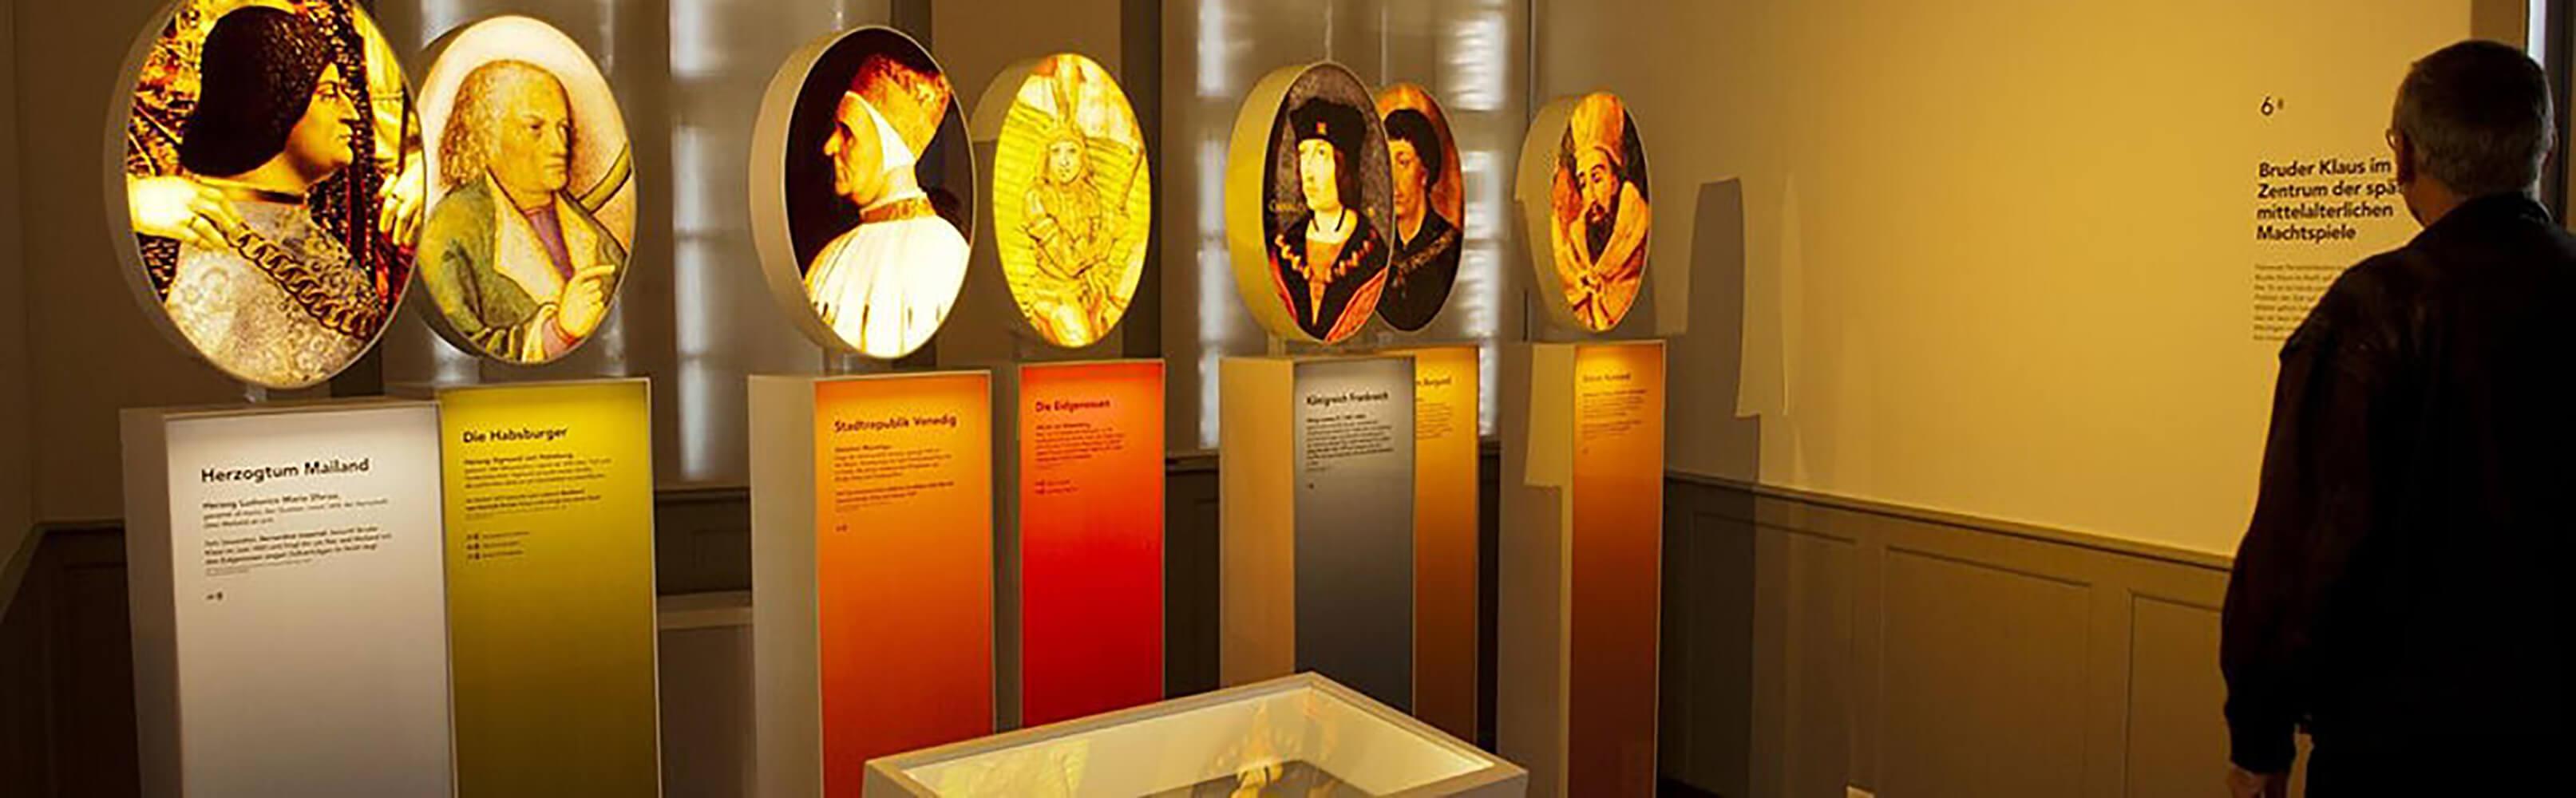 Museum Bruder Klaus Sachseln 1